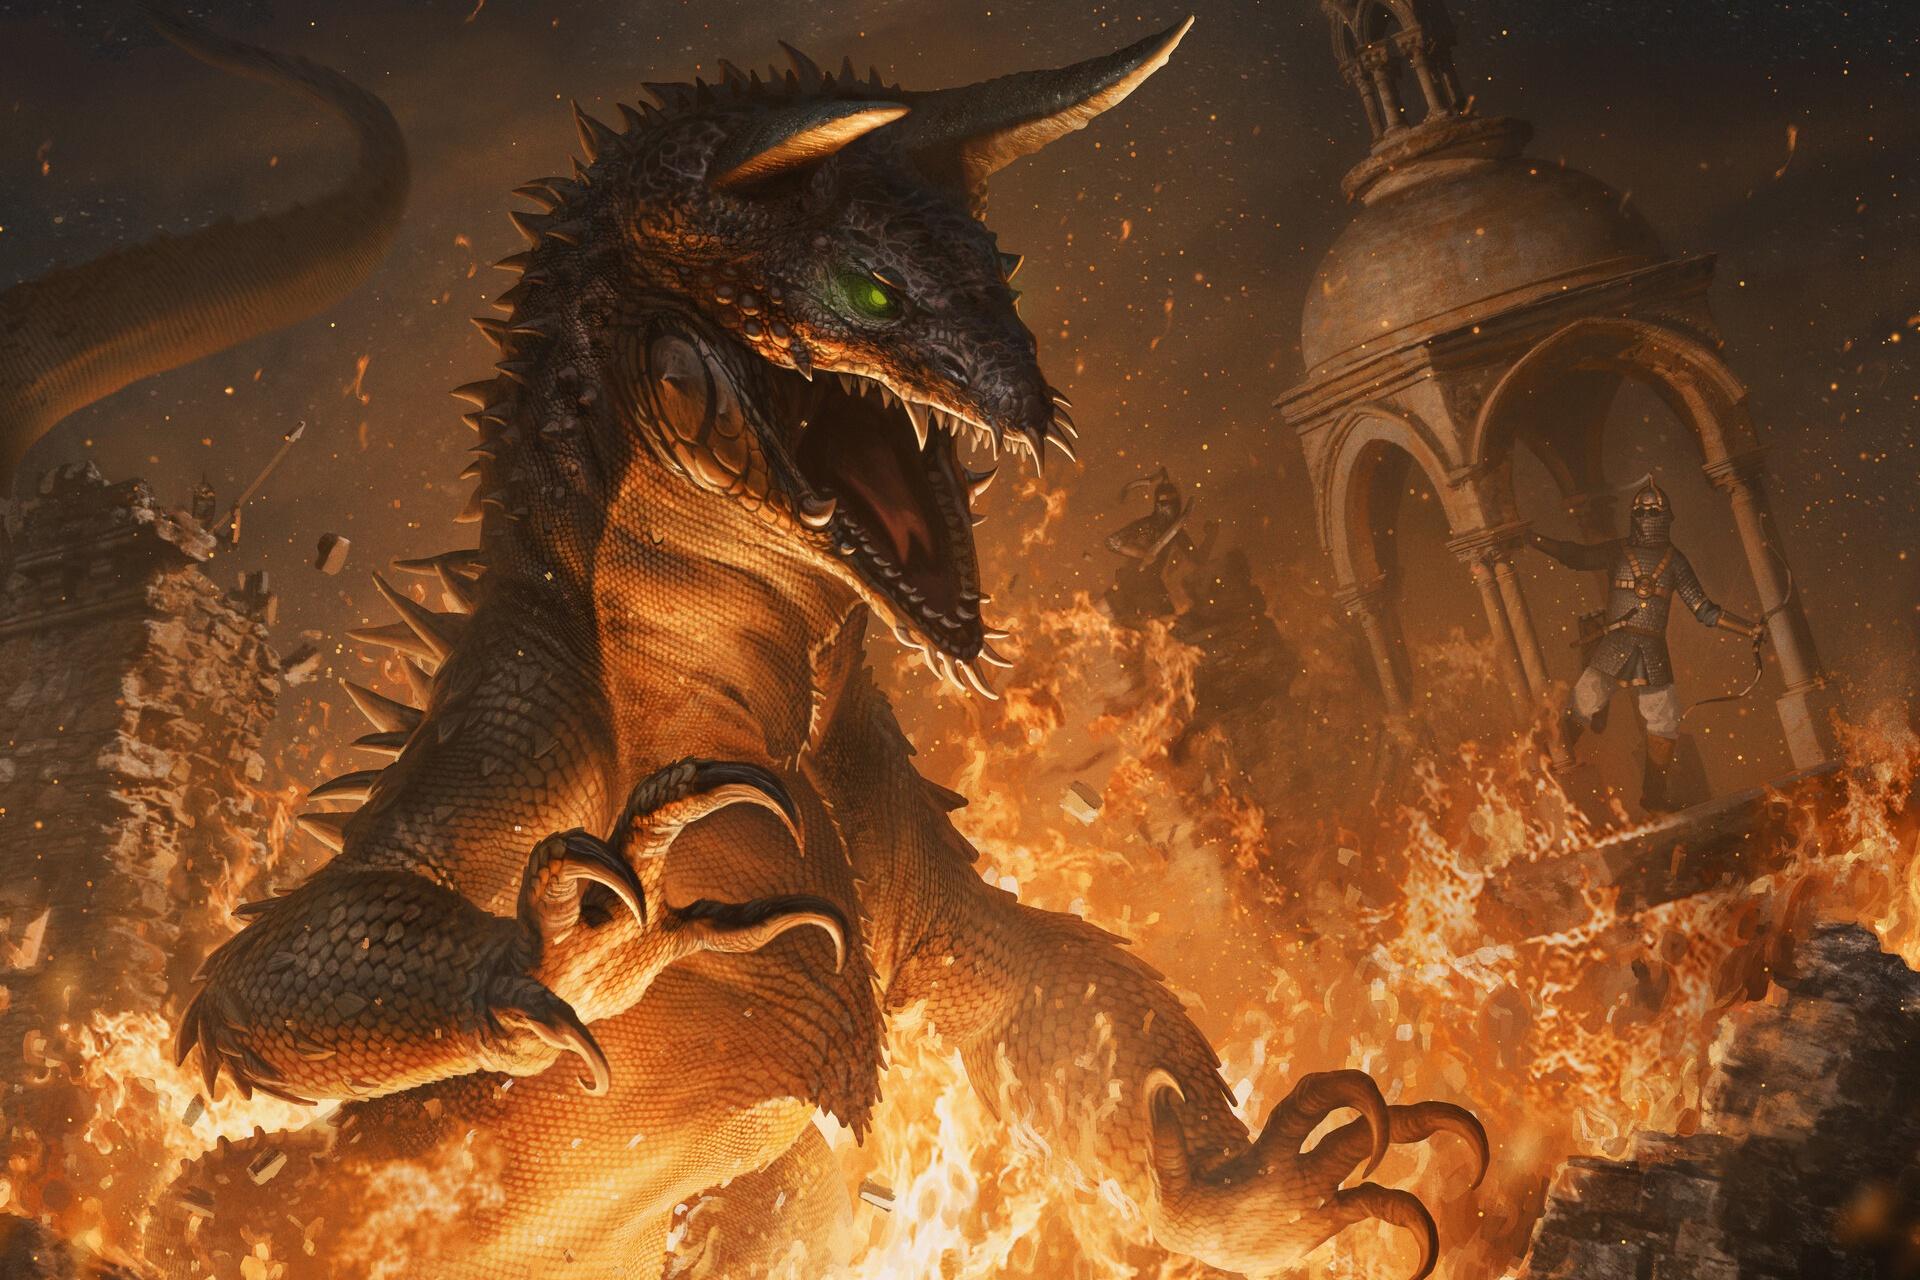 Creature Flame Lizard 1920x1280